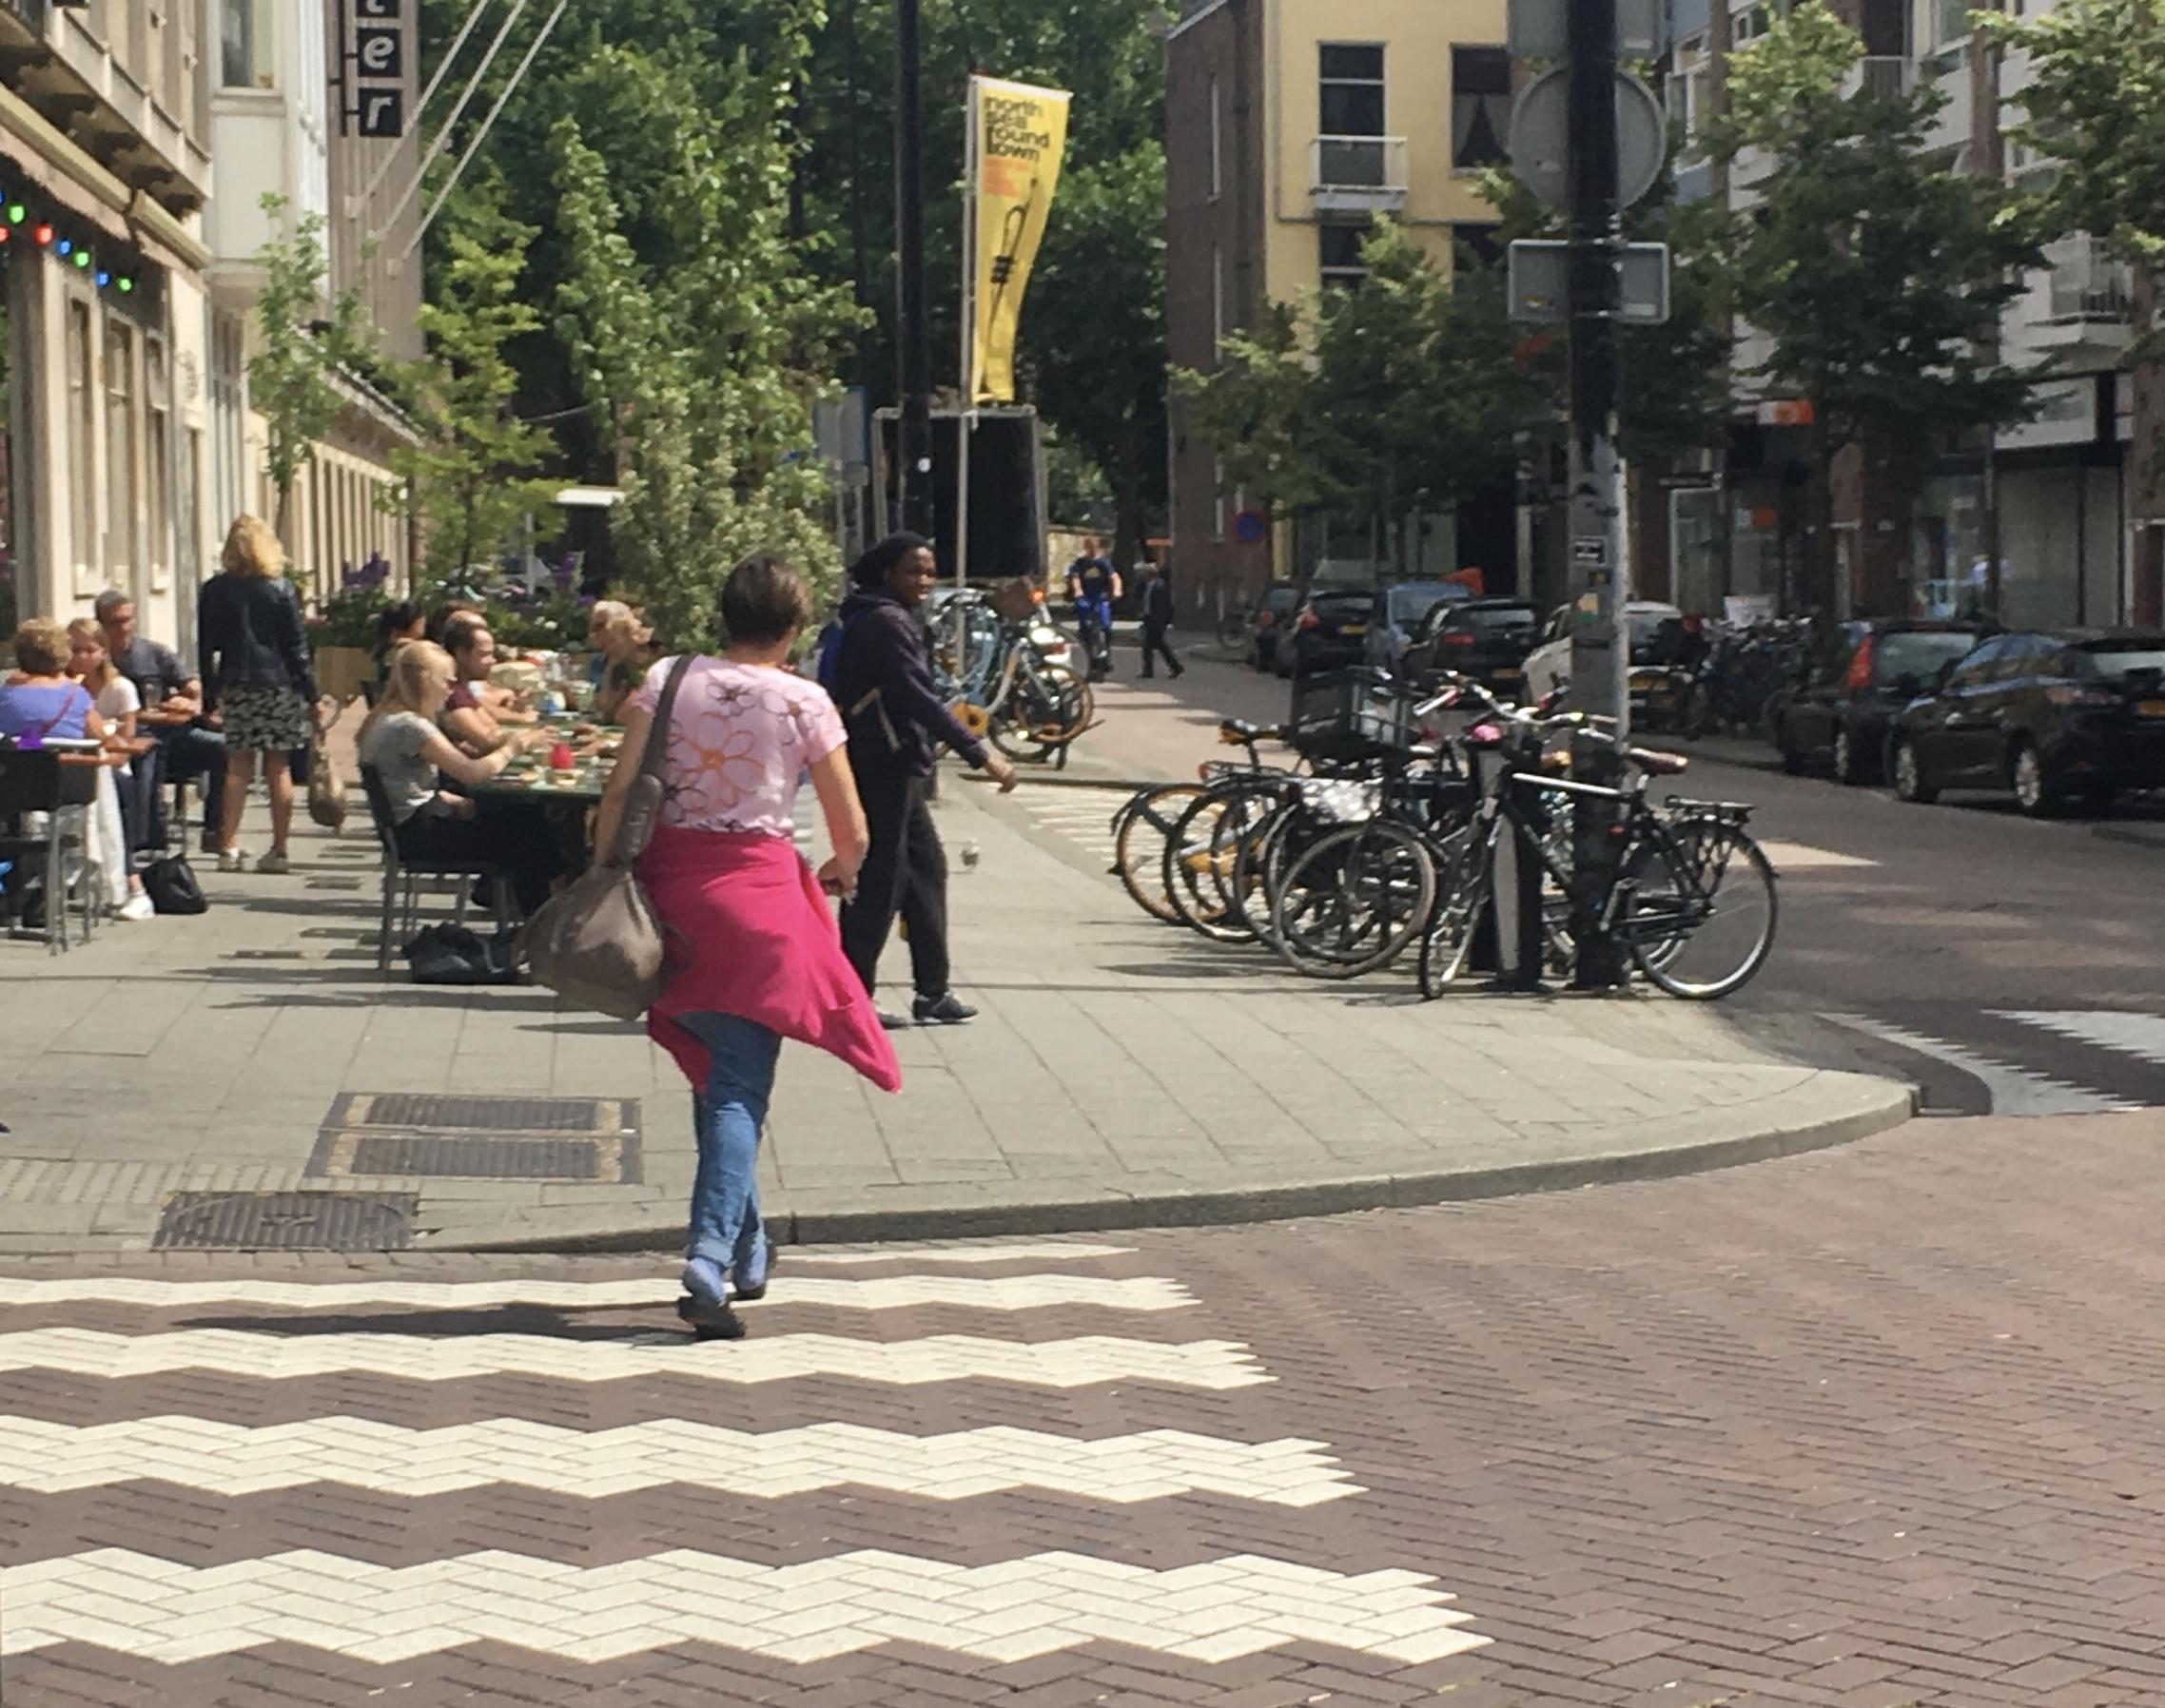 Rotterdam Crossings in happy streets